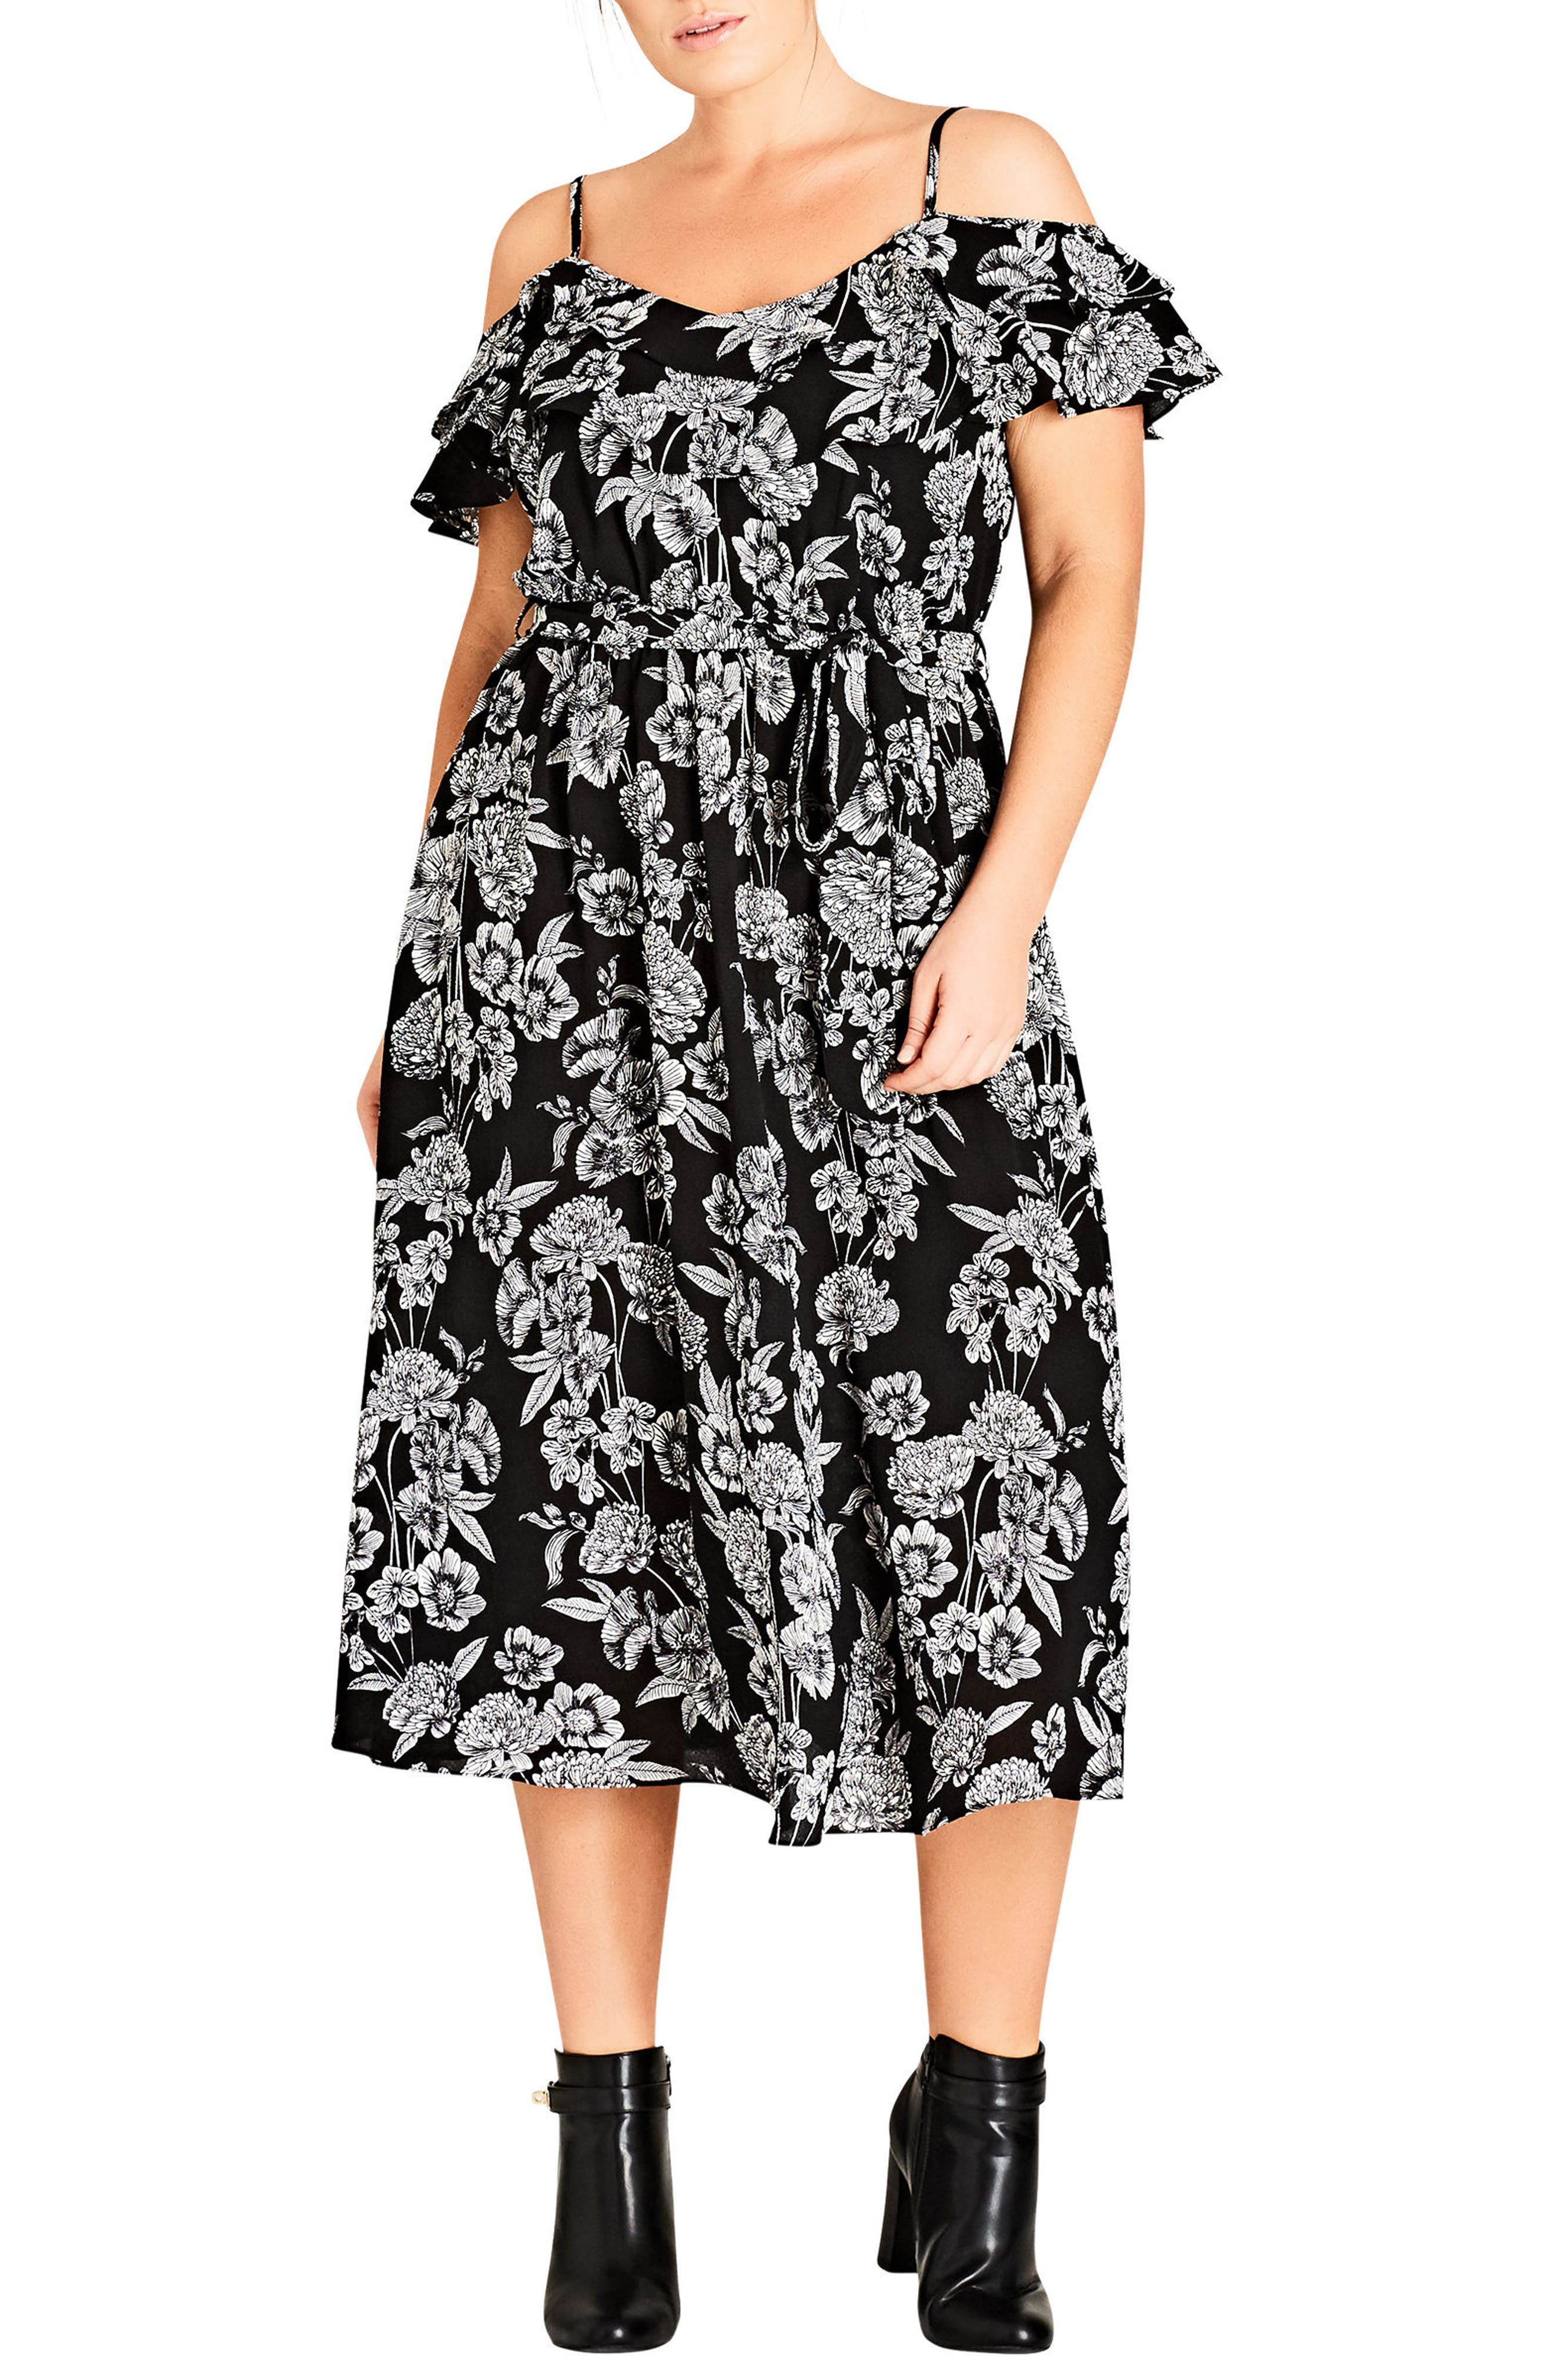 Bloomsbury Midi Dress,                             Main thumbnail 1, color,                             Bloomsbury